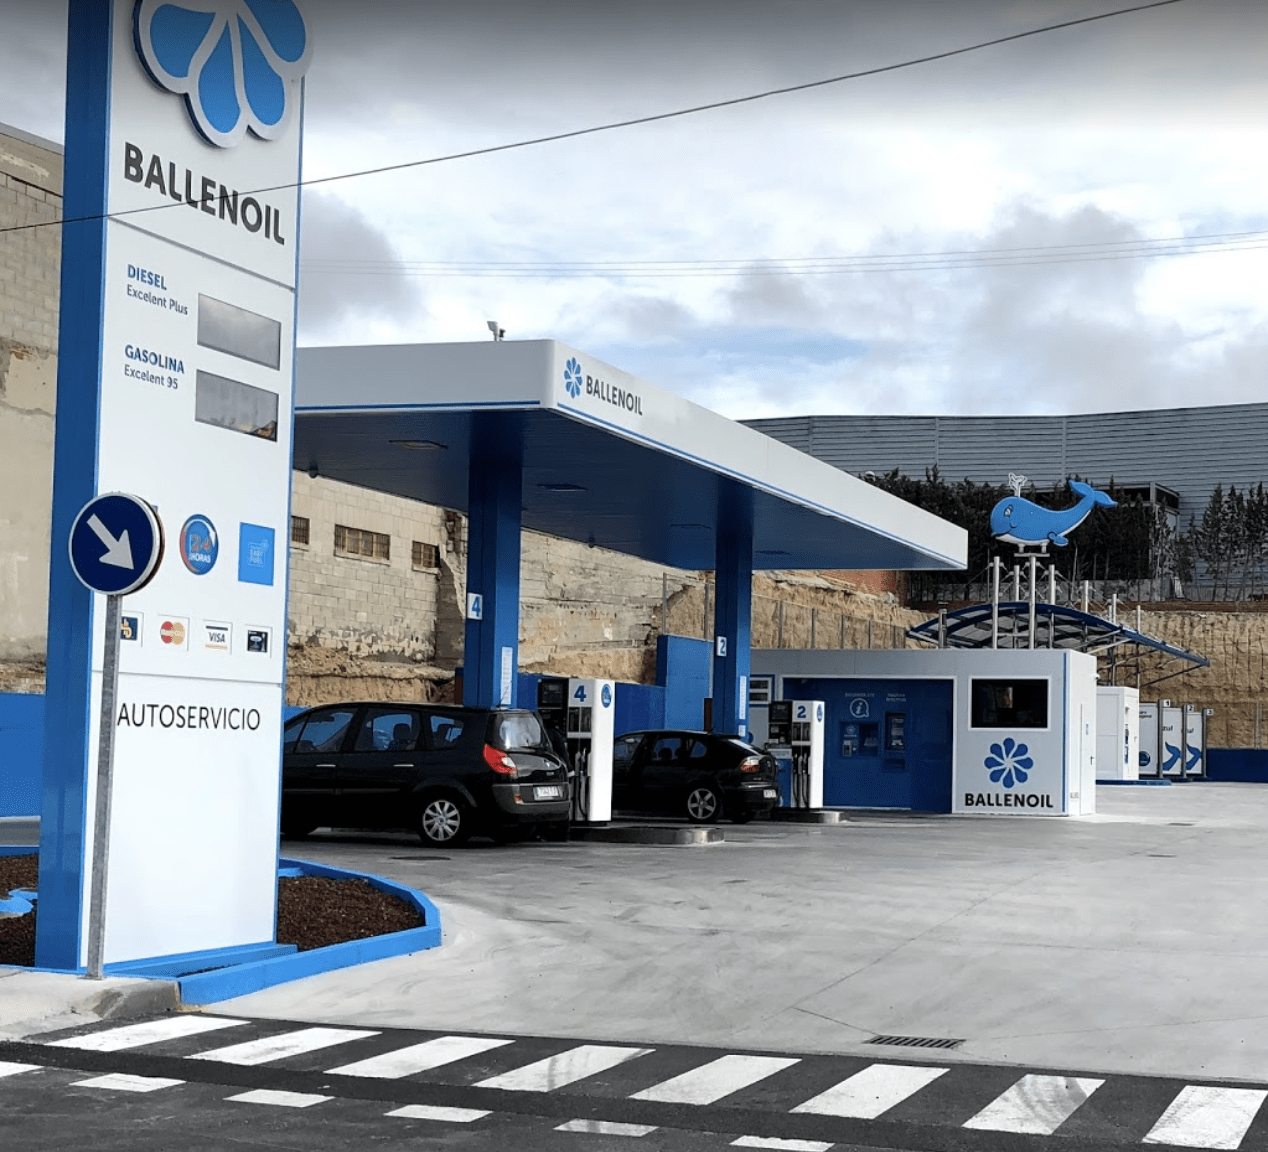 Gasolinera Ballenoil Navalcarnero